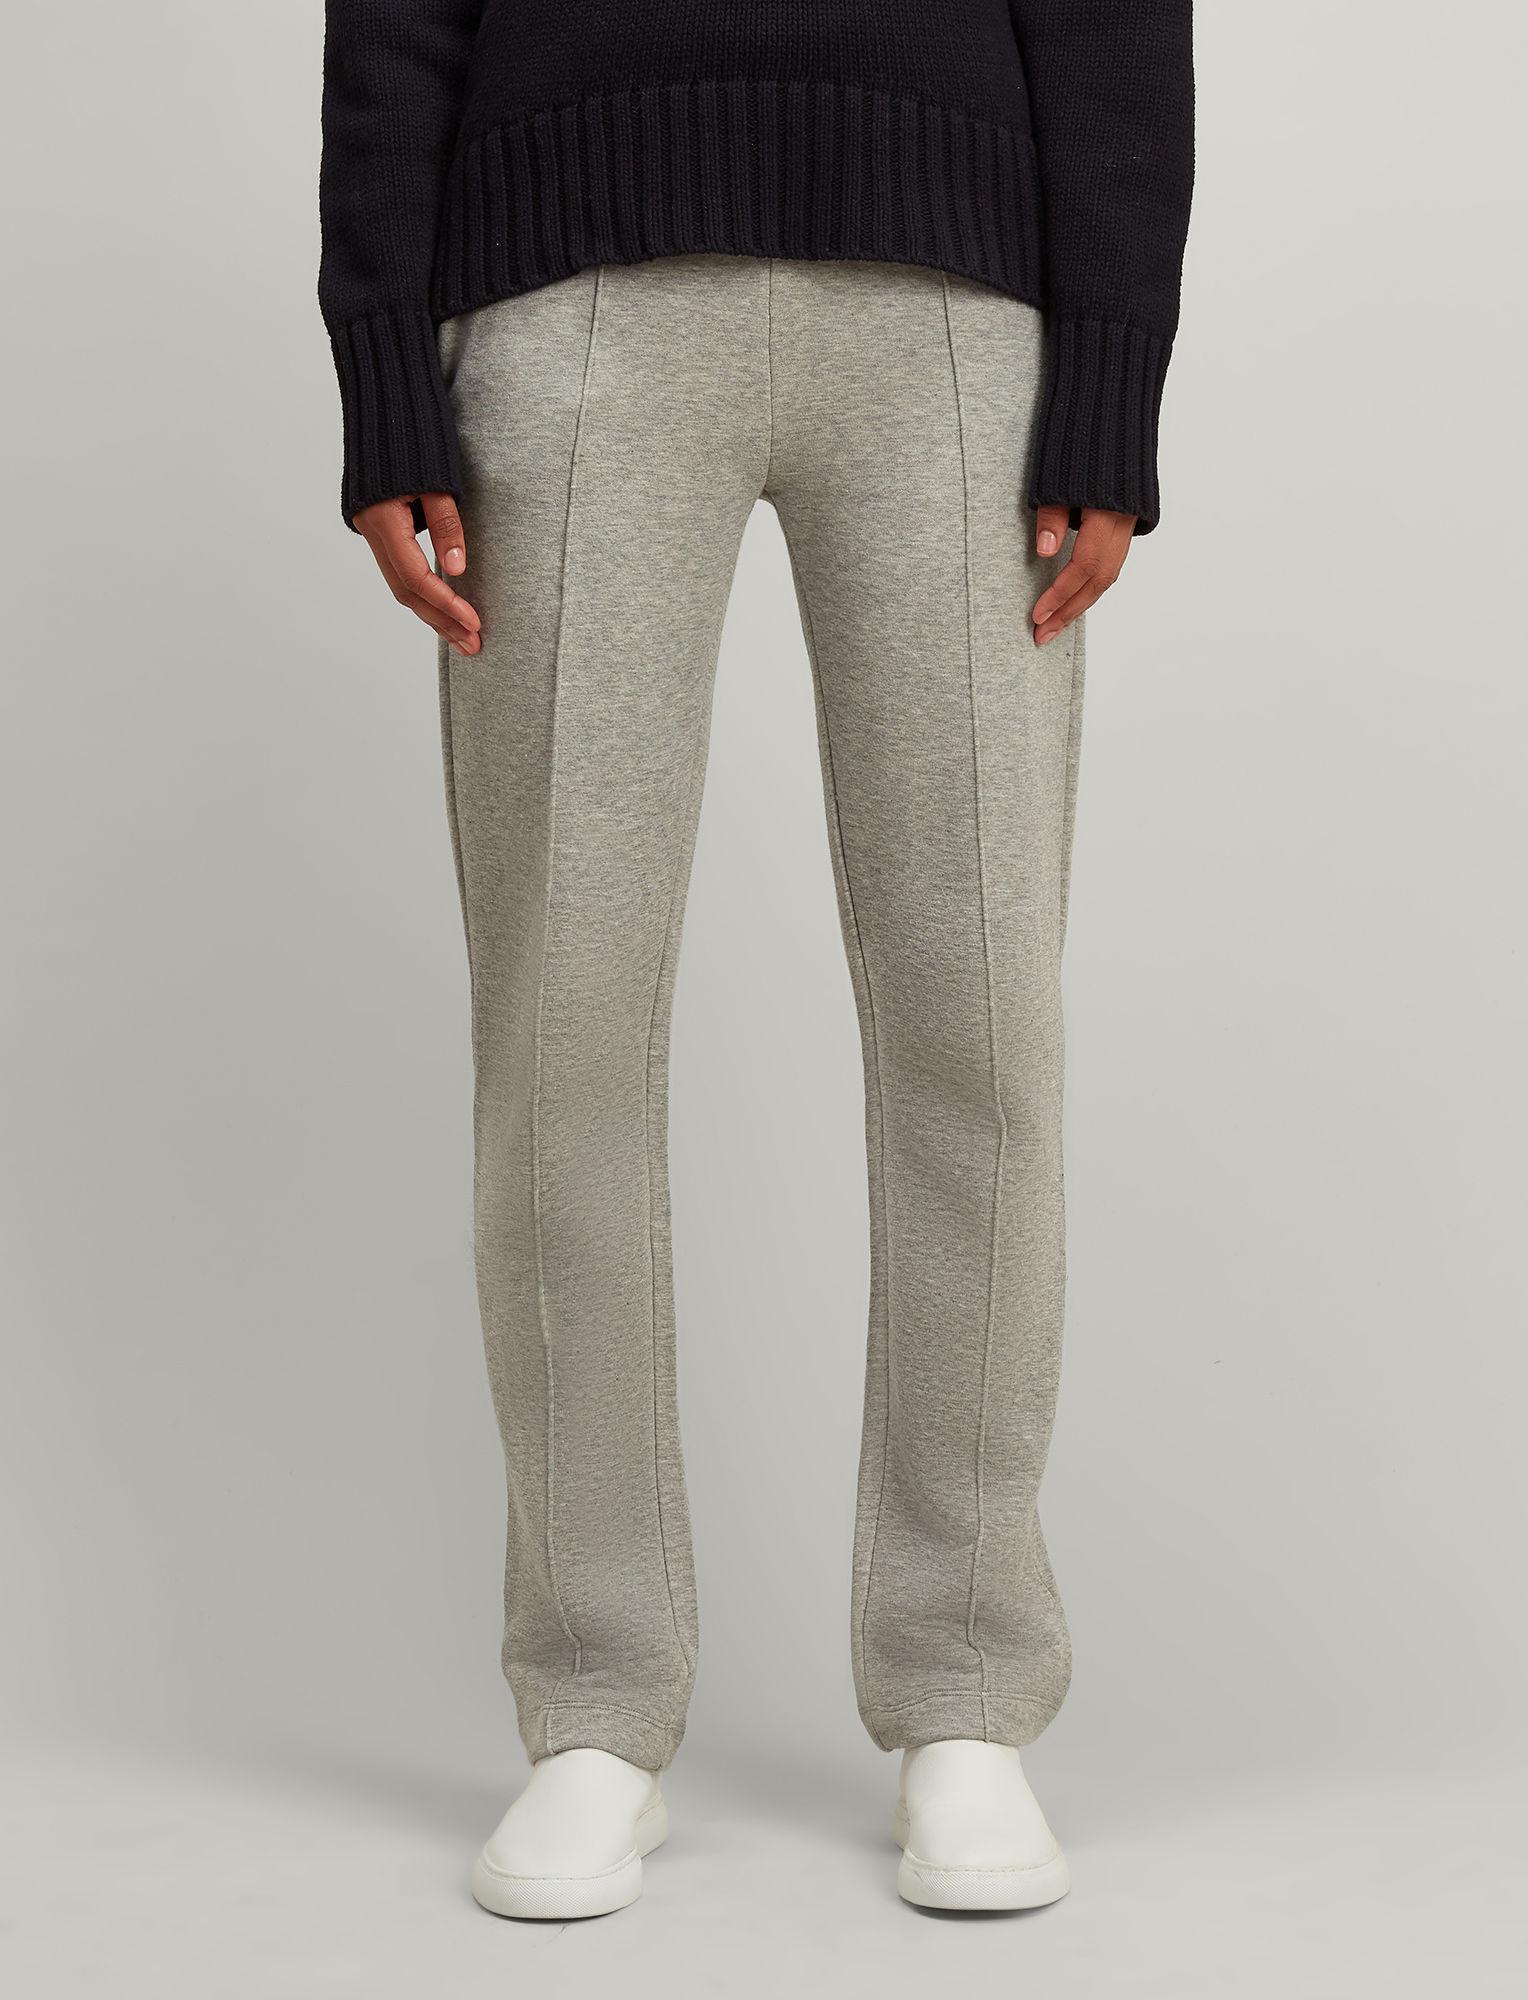 JOSEPH Cotton Molleton Jersey Jog Pant in Grey for Men